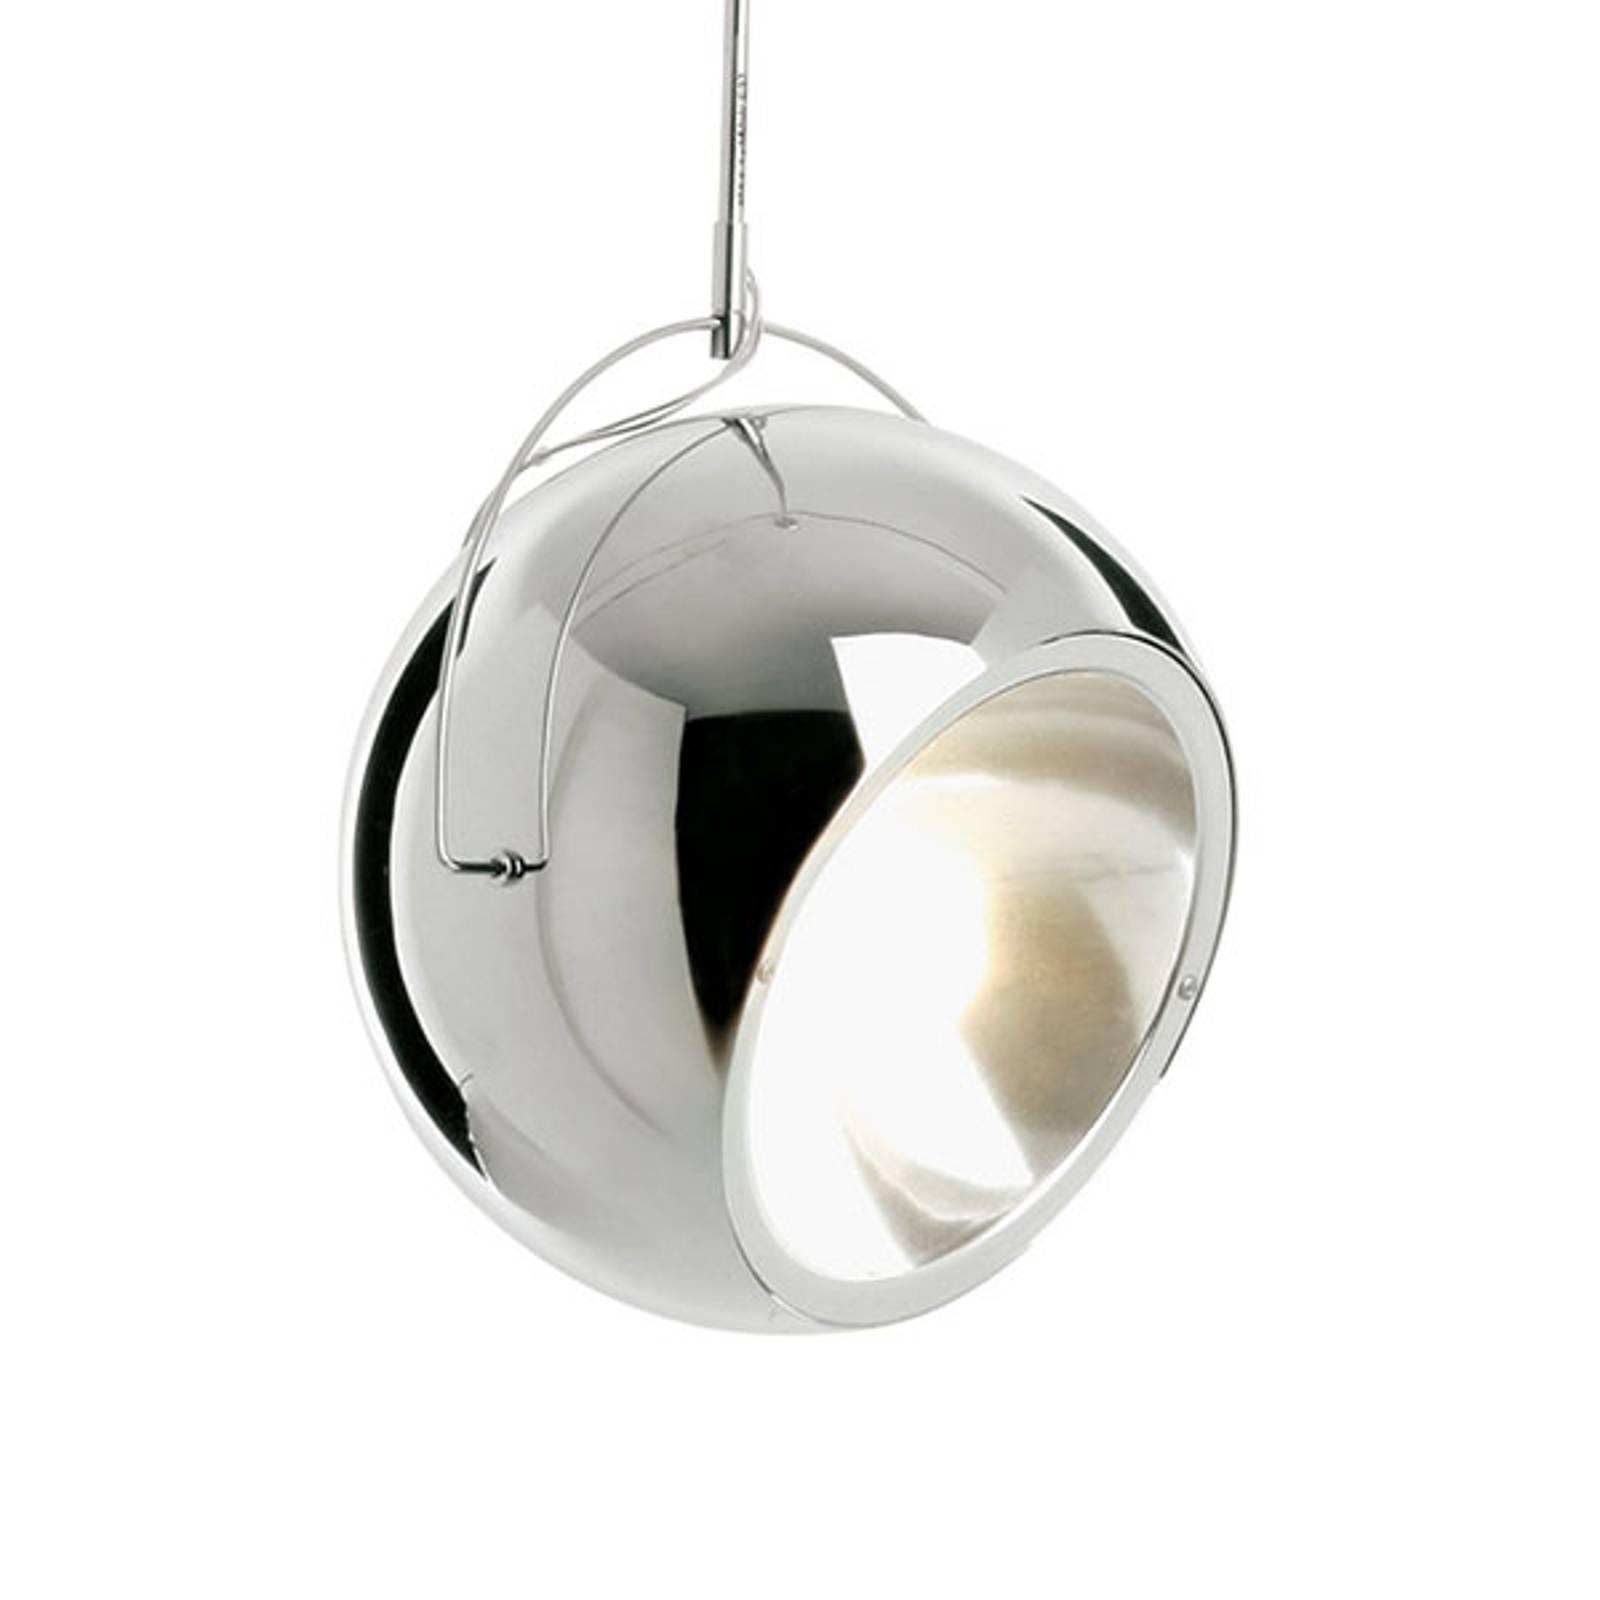 Fabbian Beluga staal chroom-hanglamp, Ø 20 cm